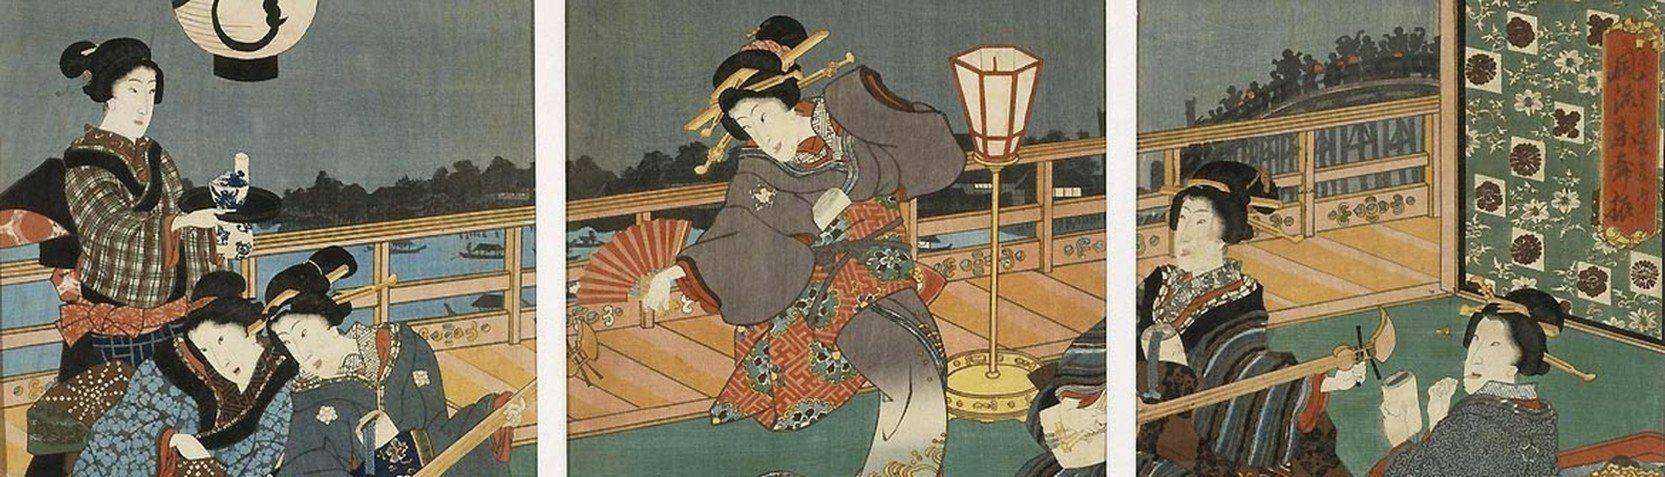 Artyści - Utagawa Kunisada